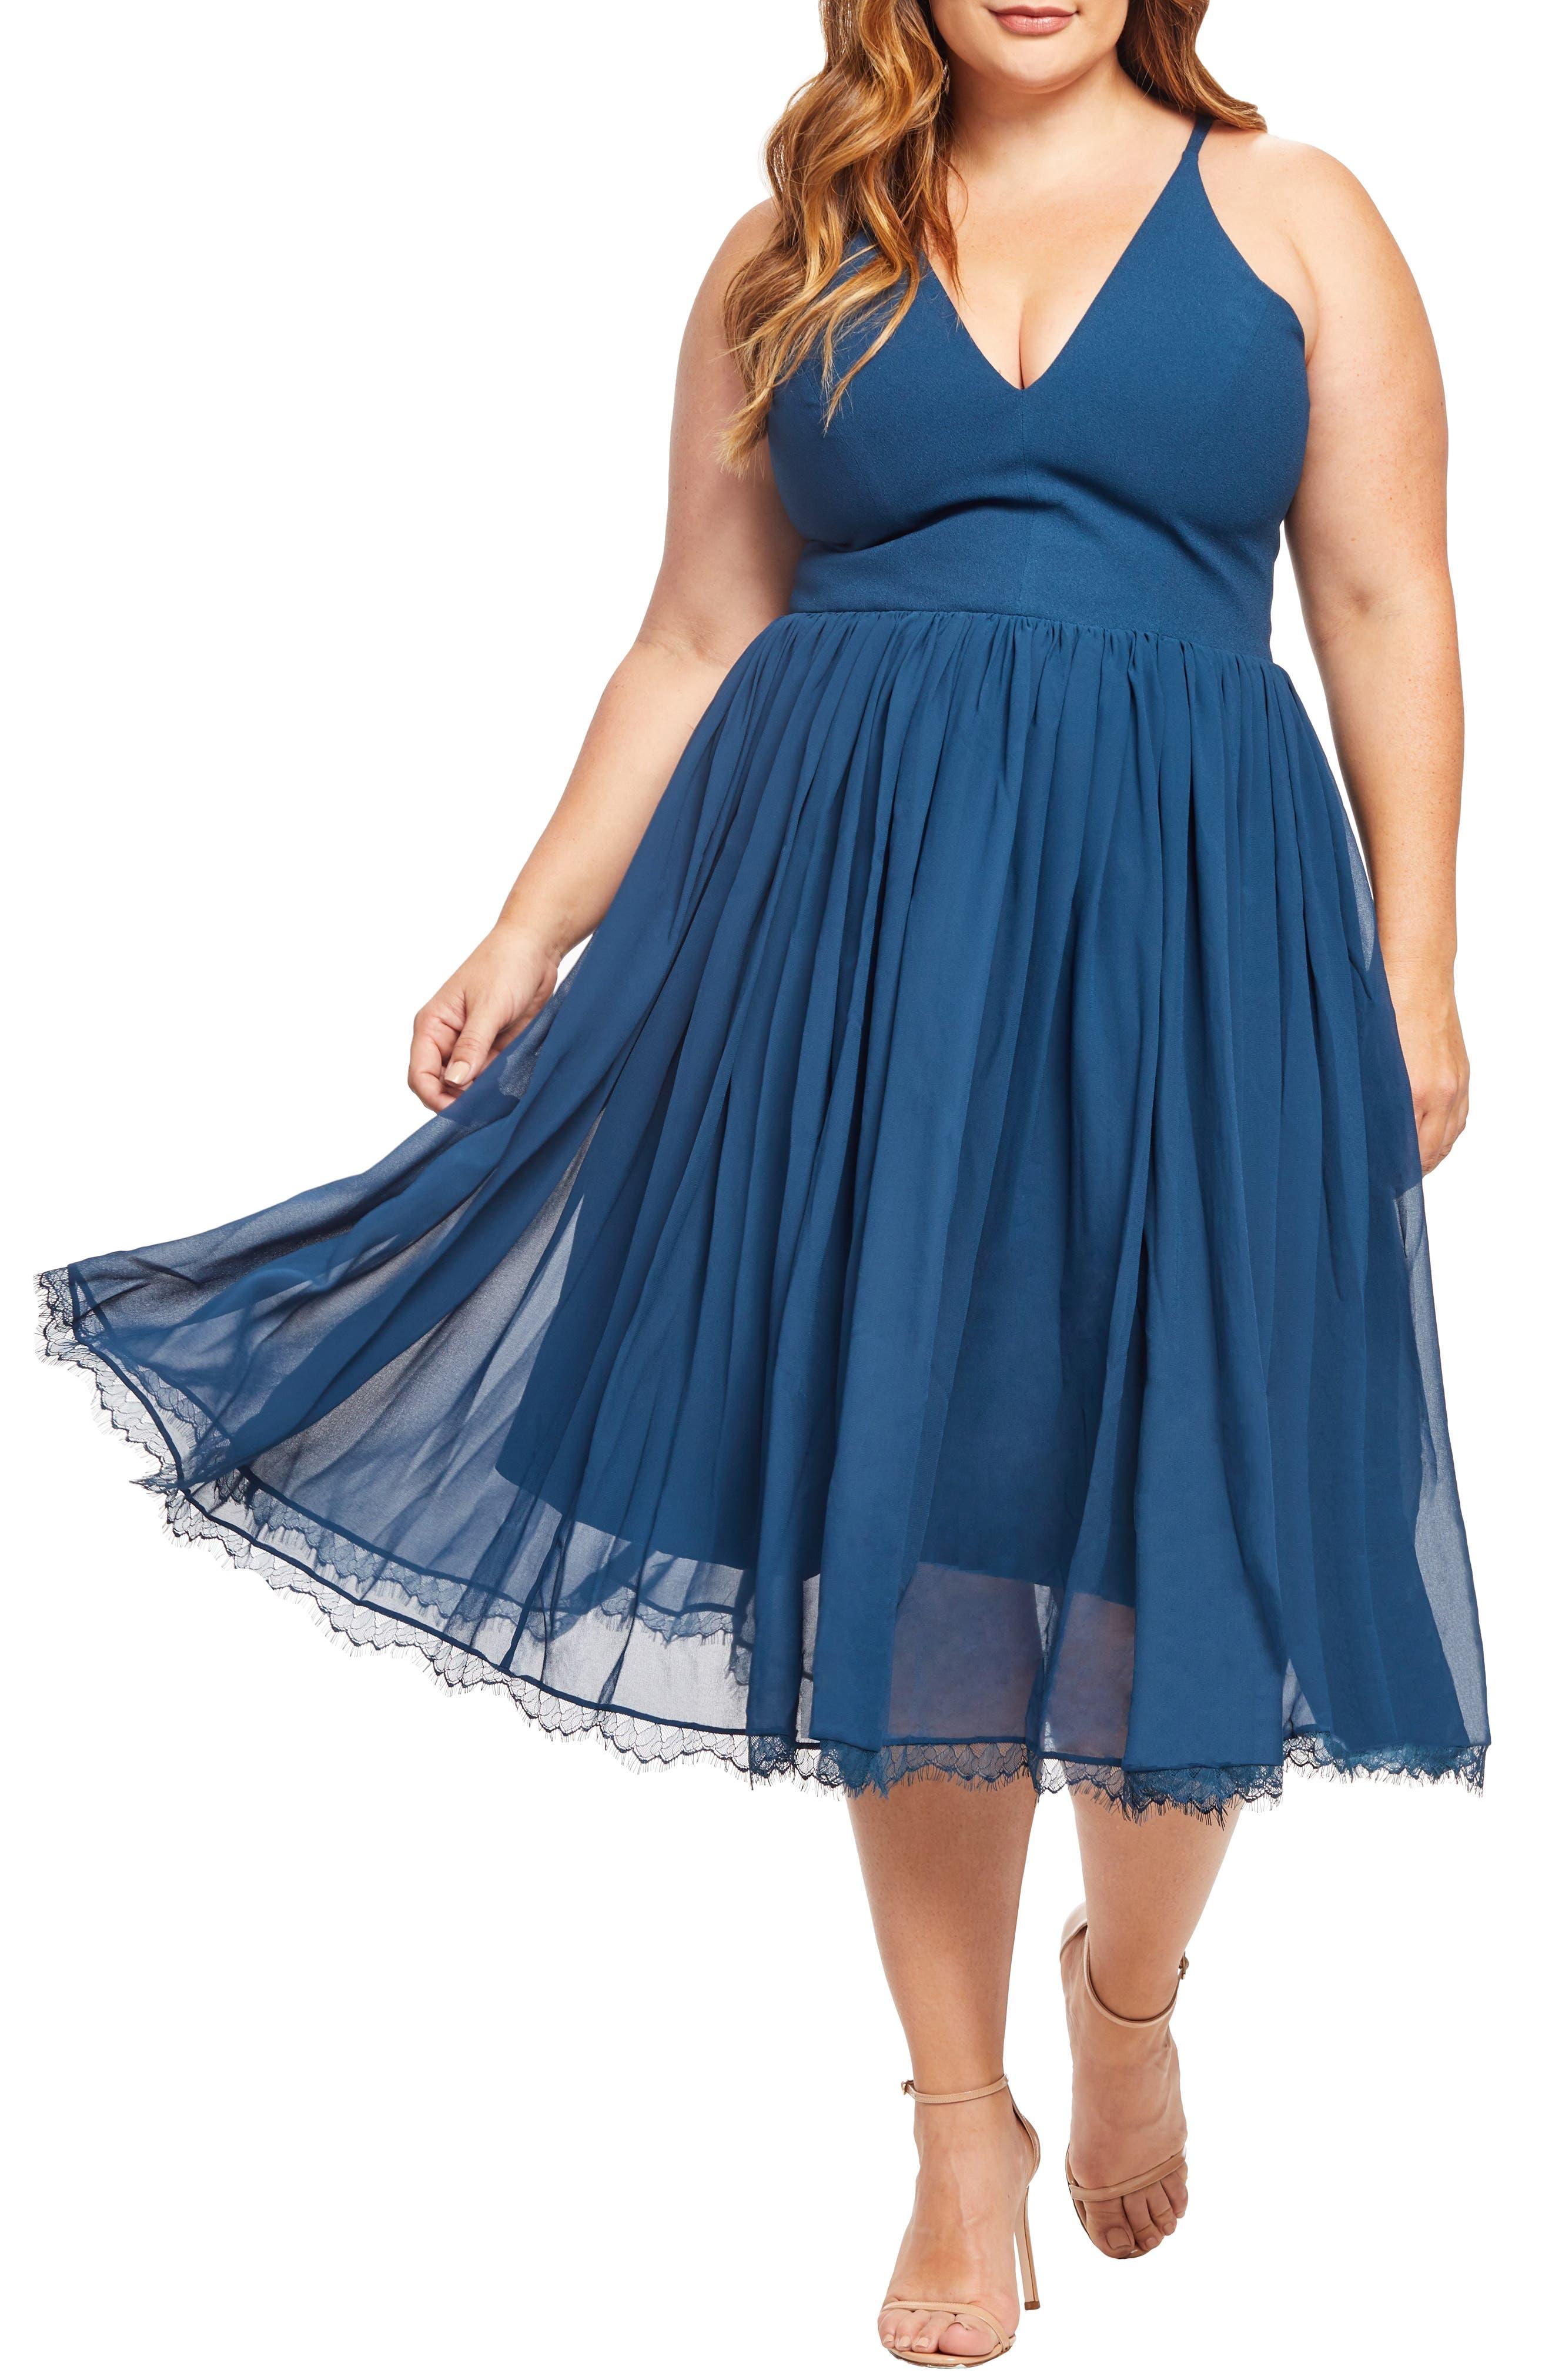 Alicia Mixed Media Midi Dress,                         Main,                         color, PEACOCK BLUE